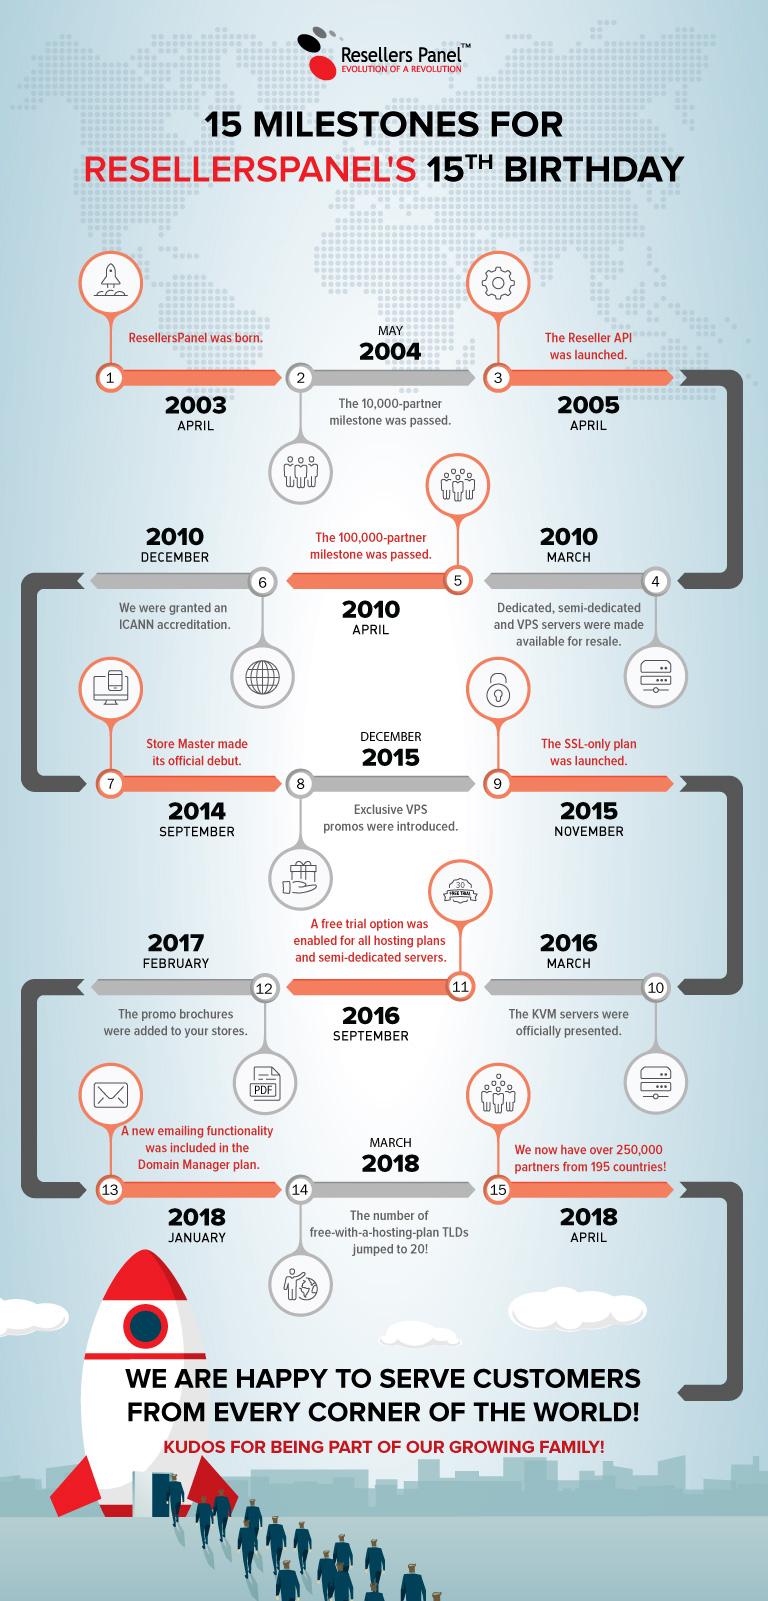 ResellersPanel birthday infographic